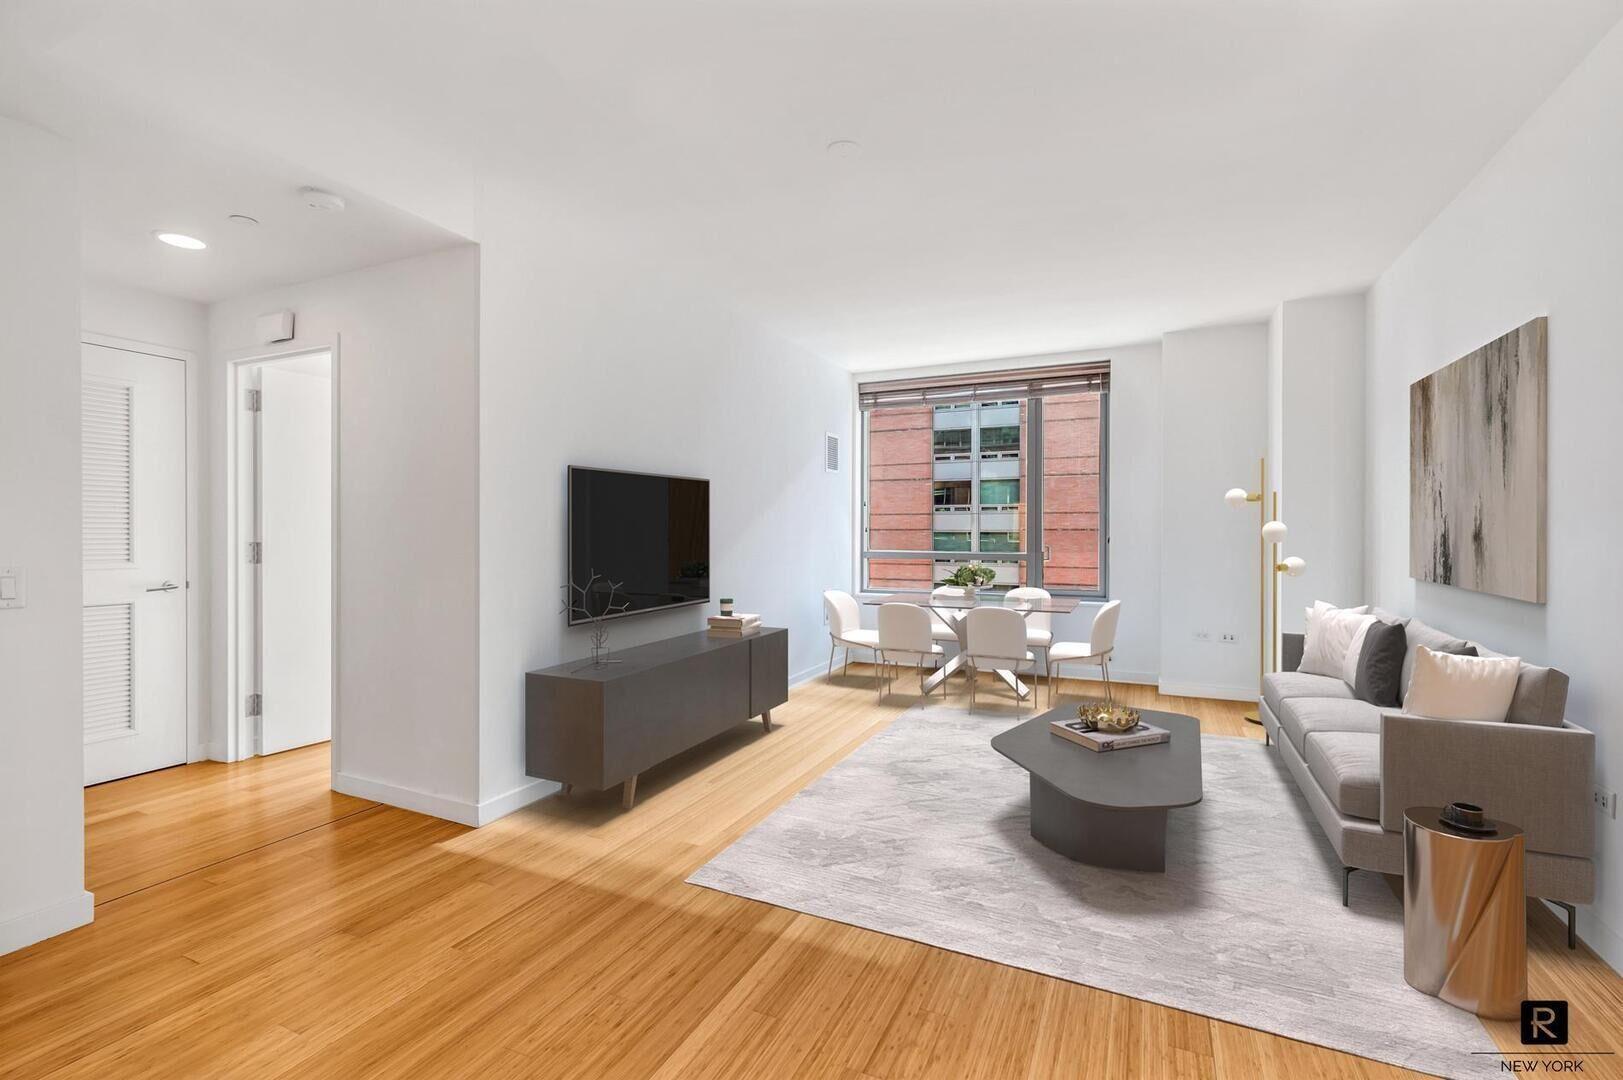 Apartment for sale at 2 River Terrace, Apt 9-C